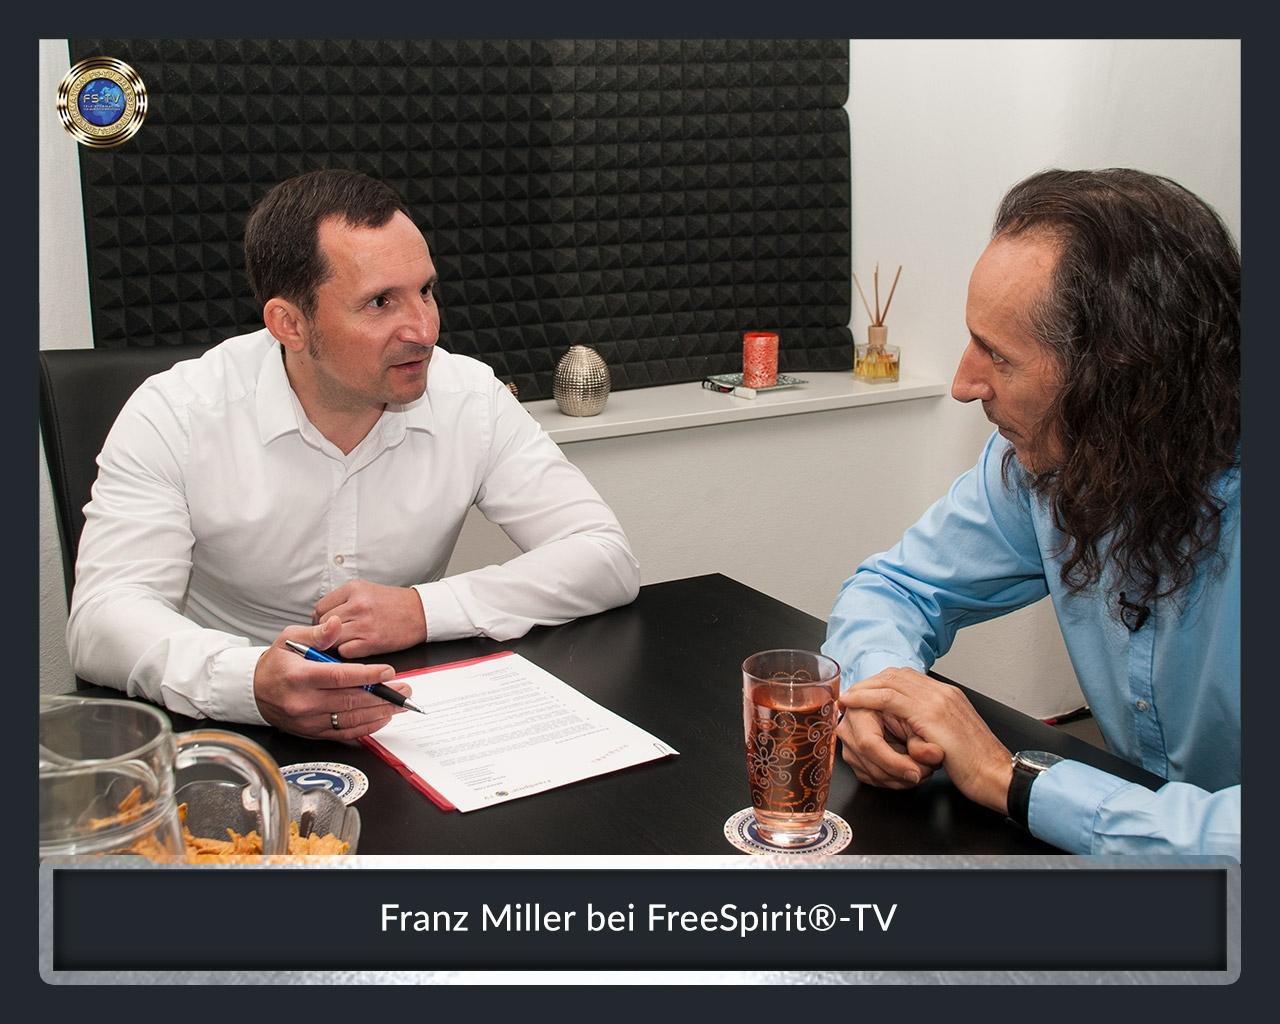 FS-TV-Bildergallerie-Franz-Miller-1